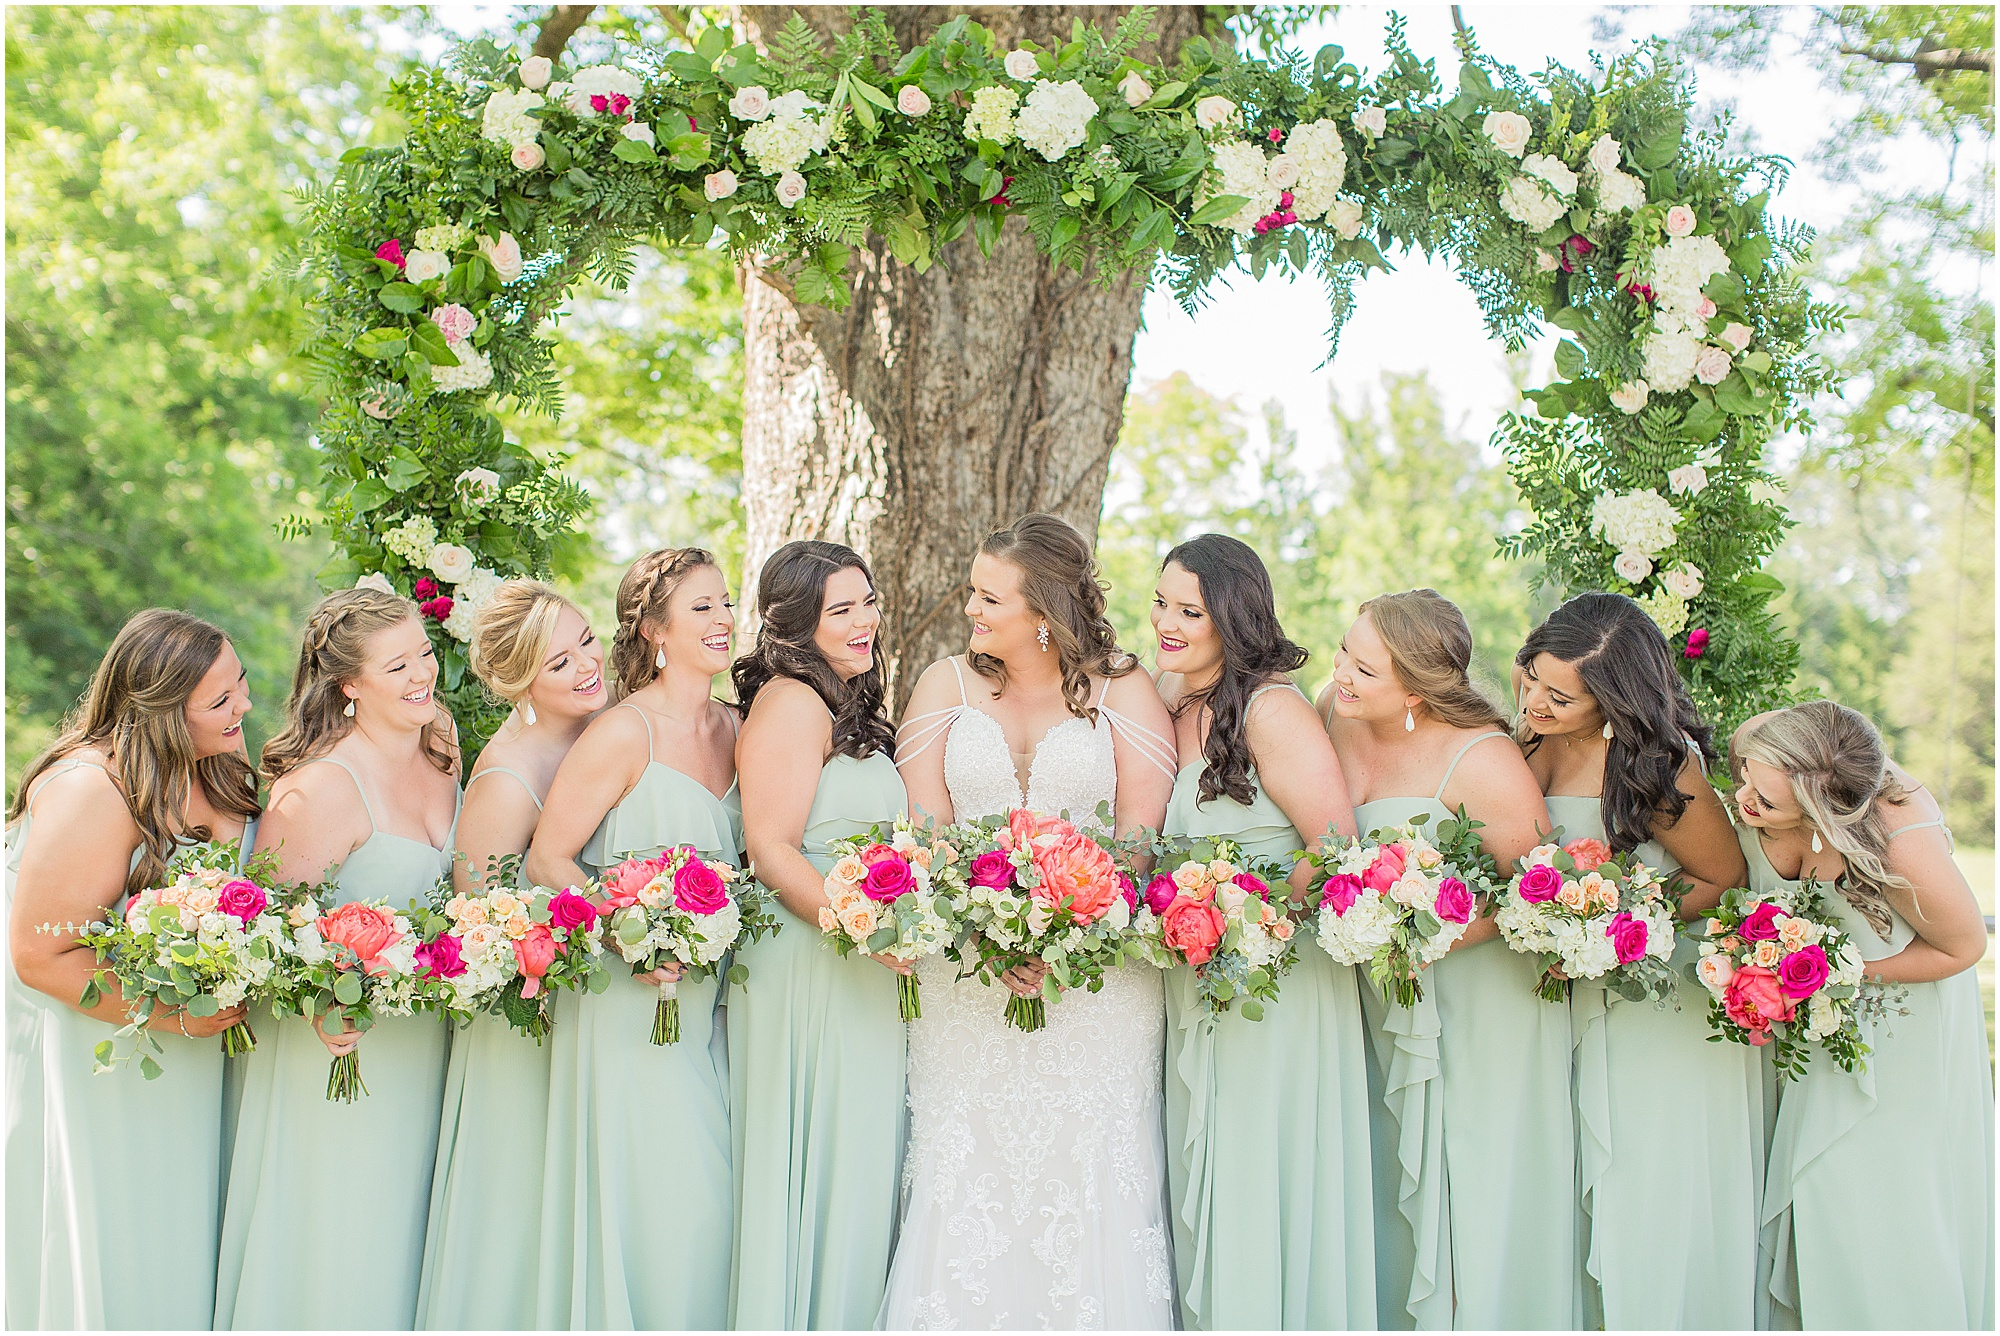 starkville-mississippi-wedding-page-place-dodson-farms_0049.jpg